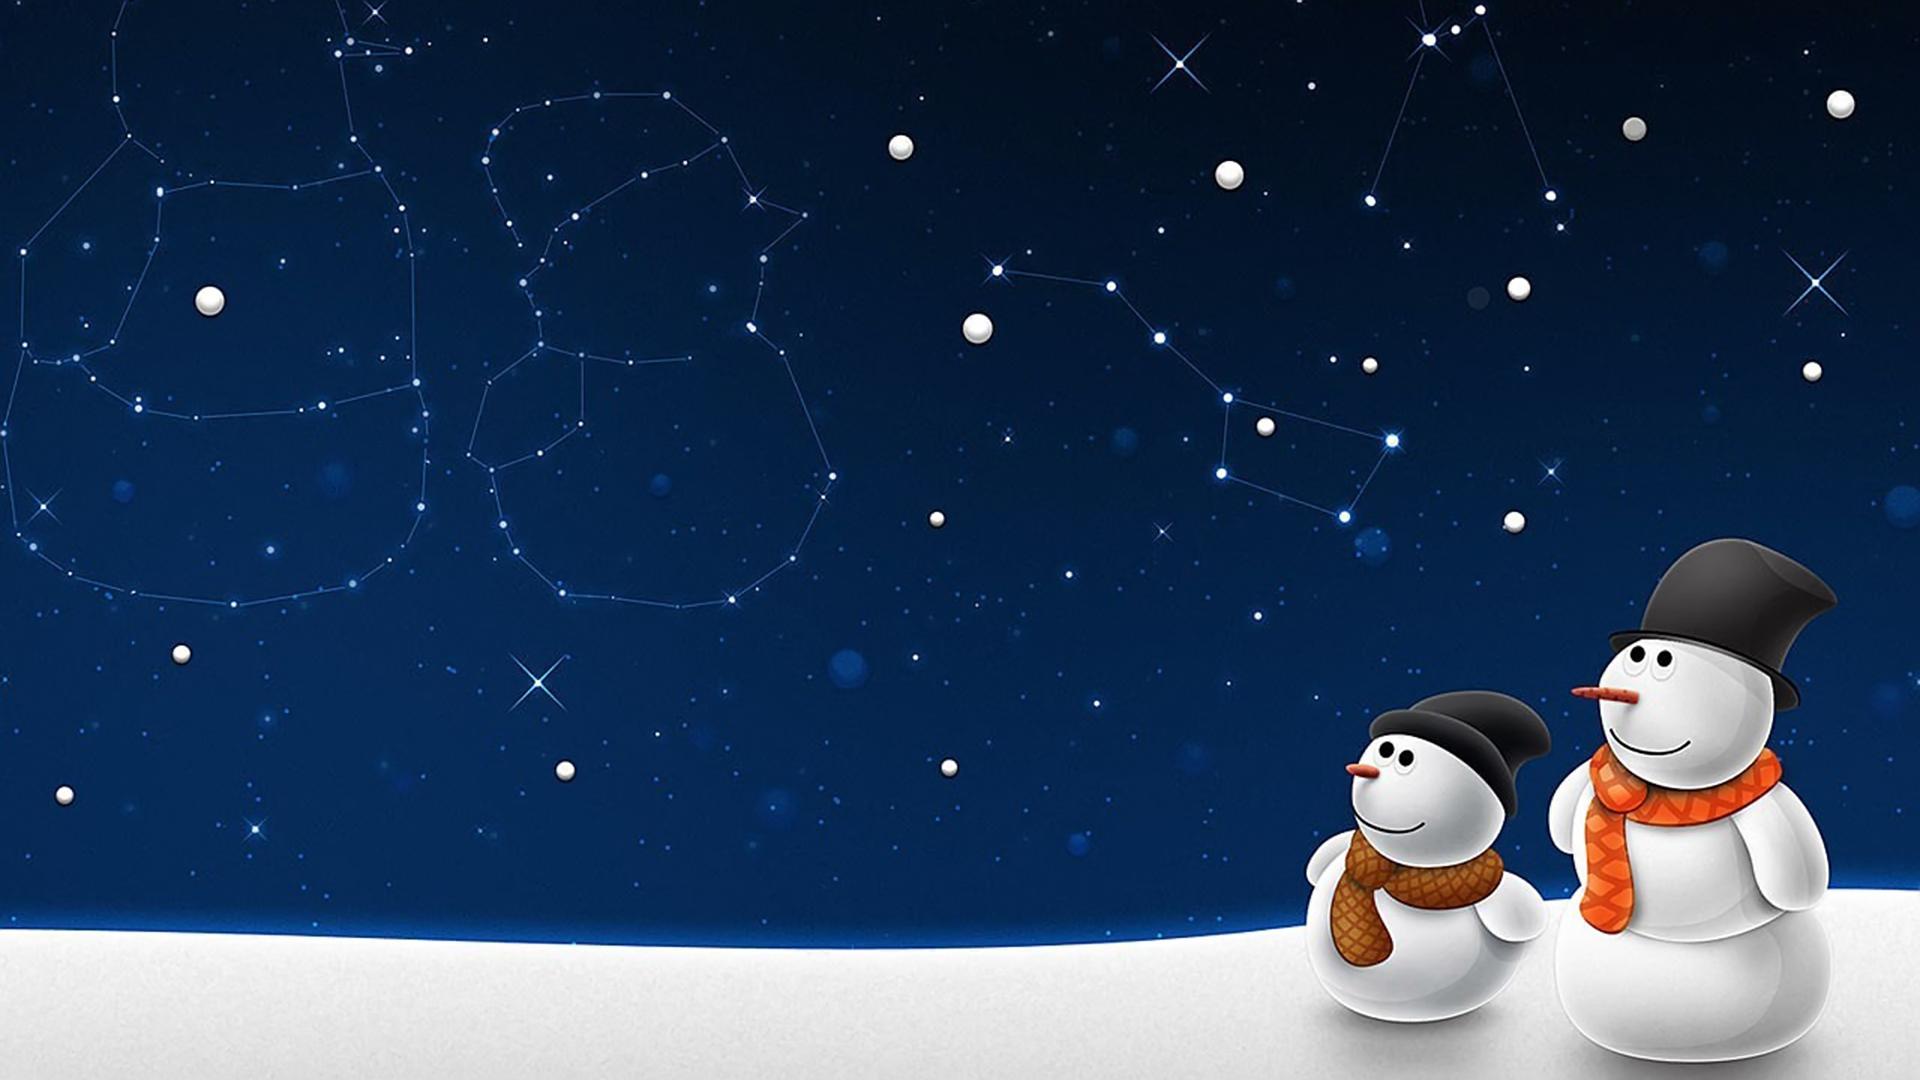 Christmas Desktop Backgrounds wallpaper   270799 1920x1080